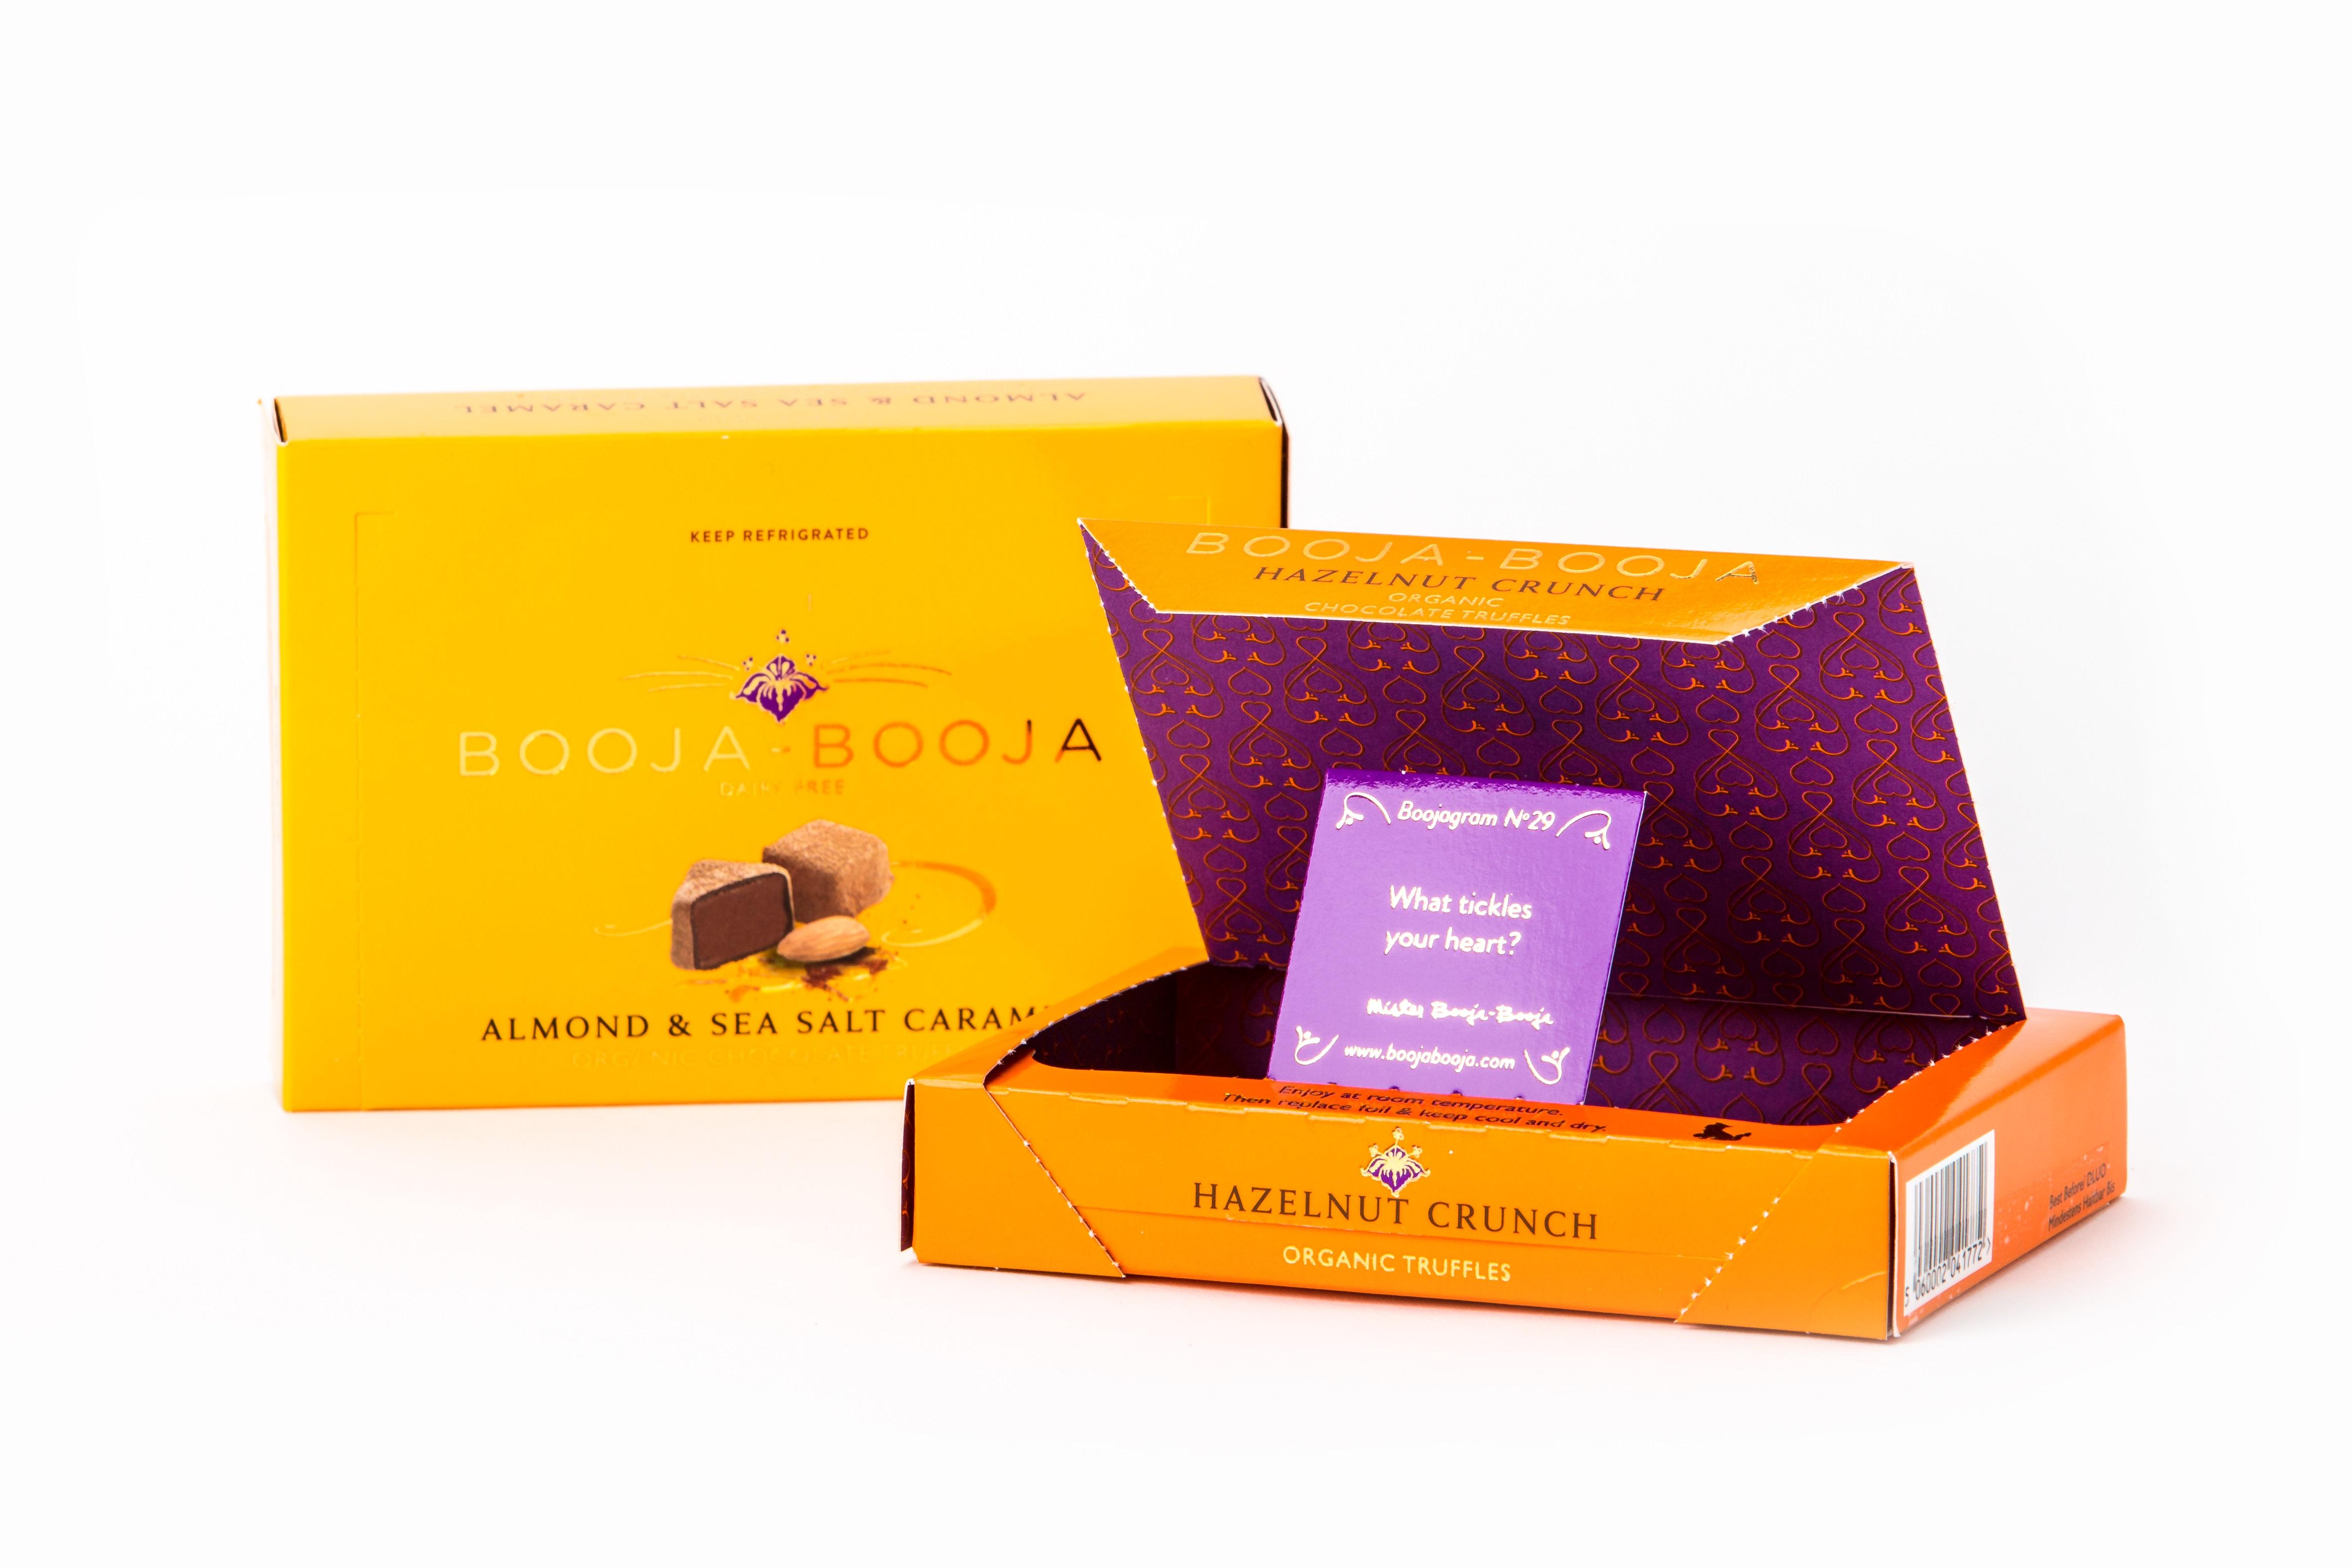 choc truffle award winning carton 2